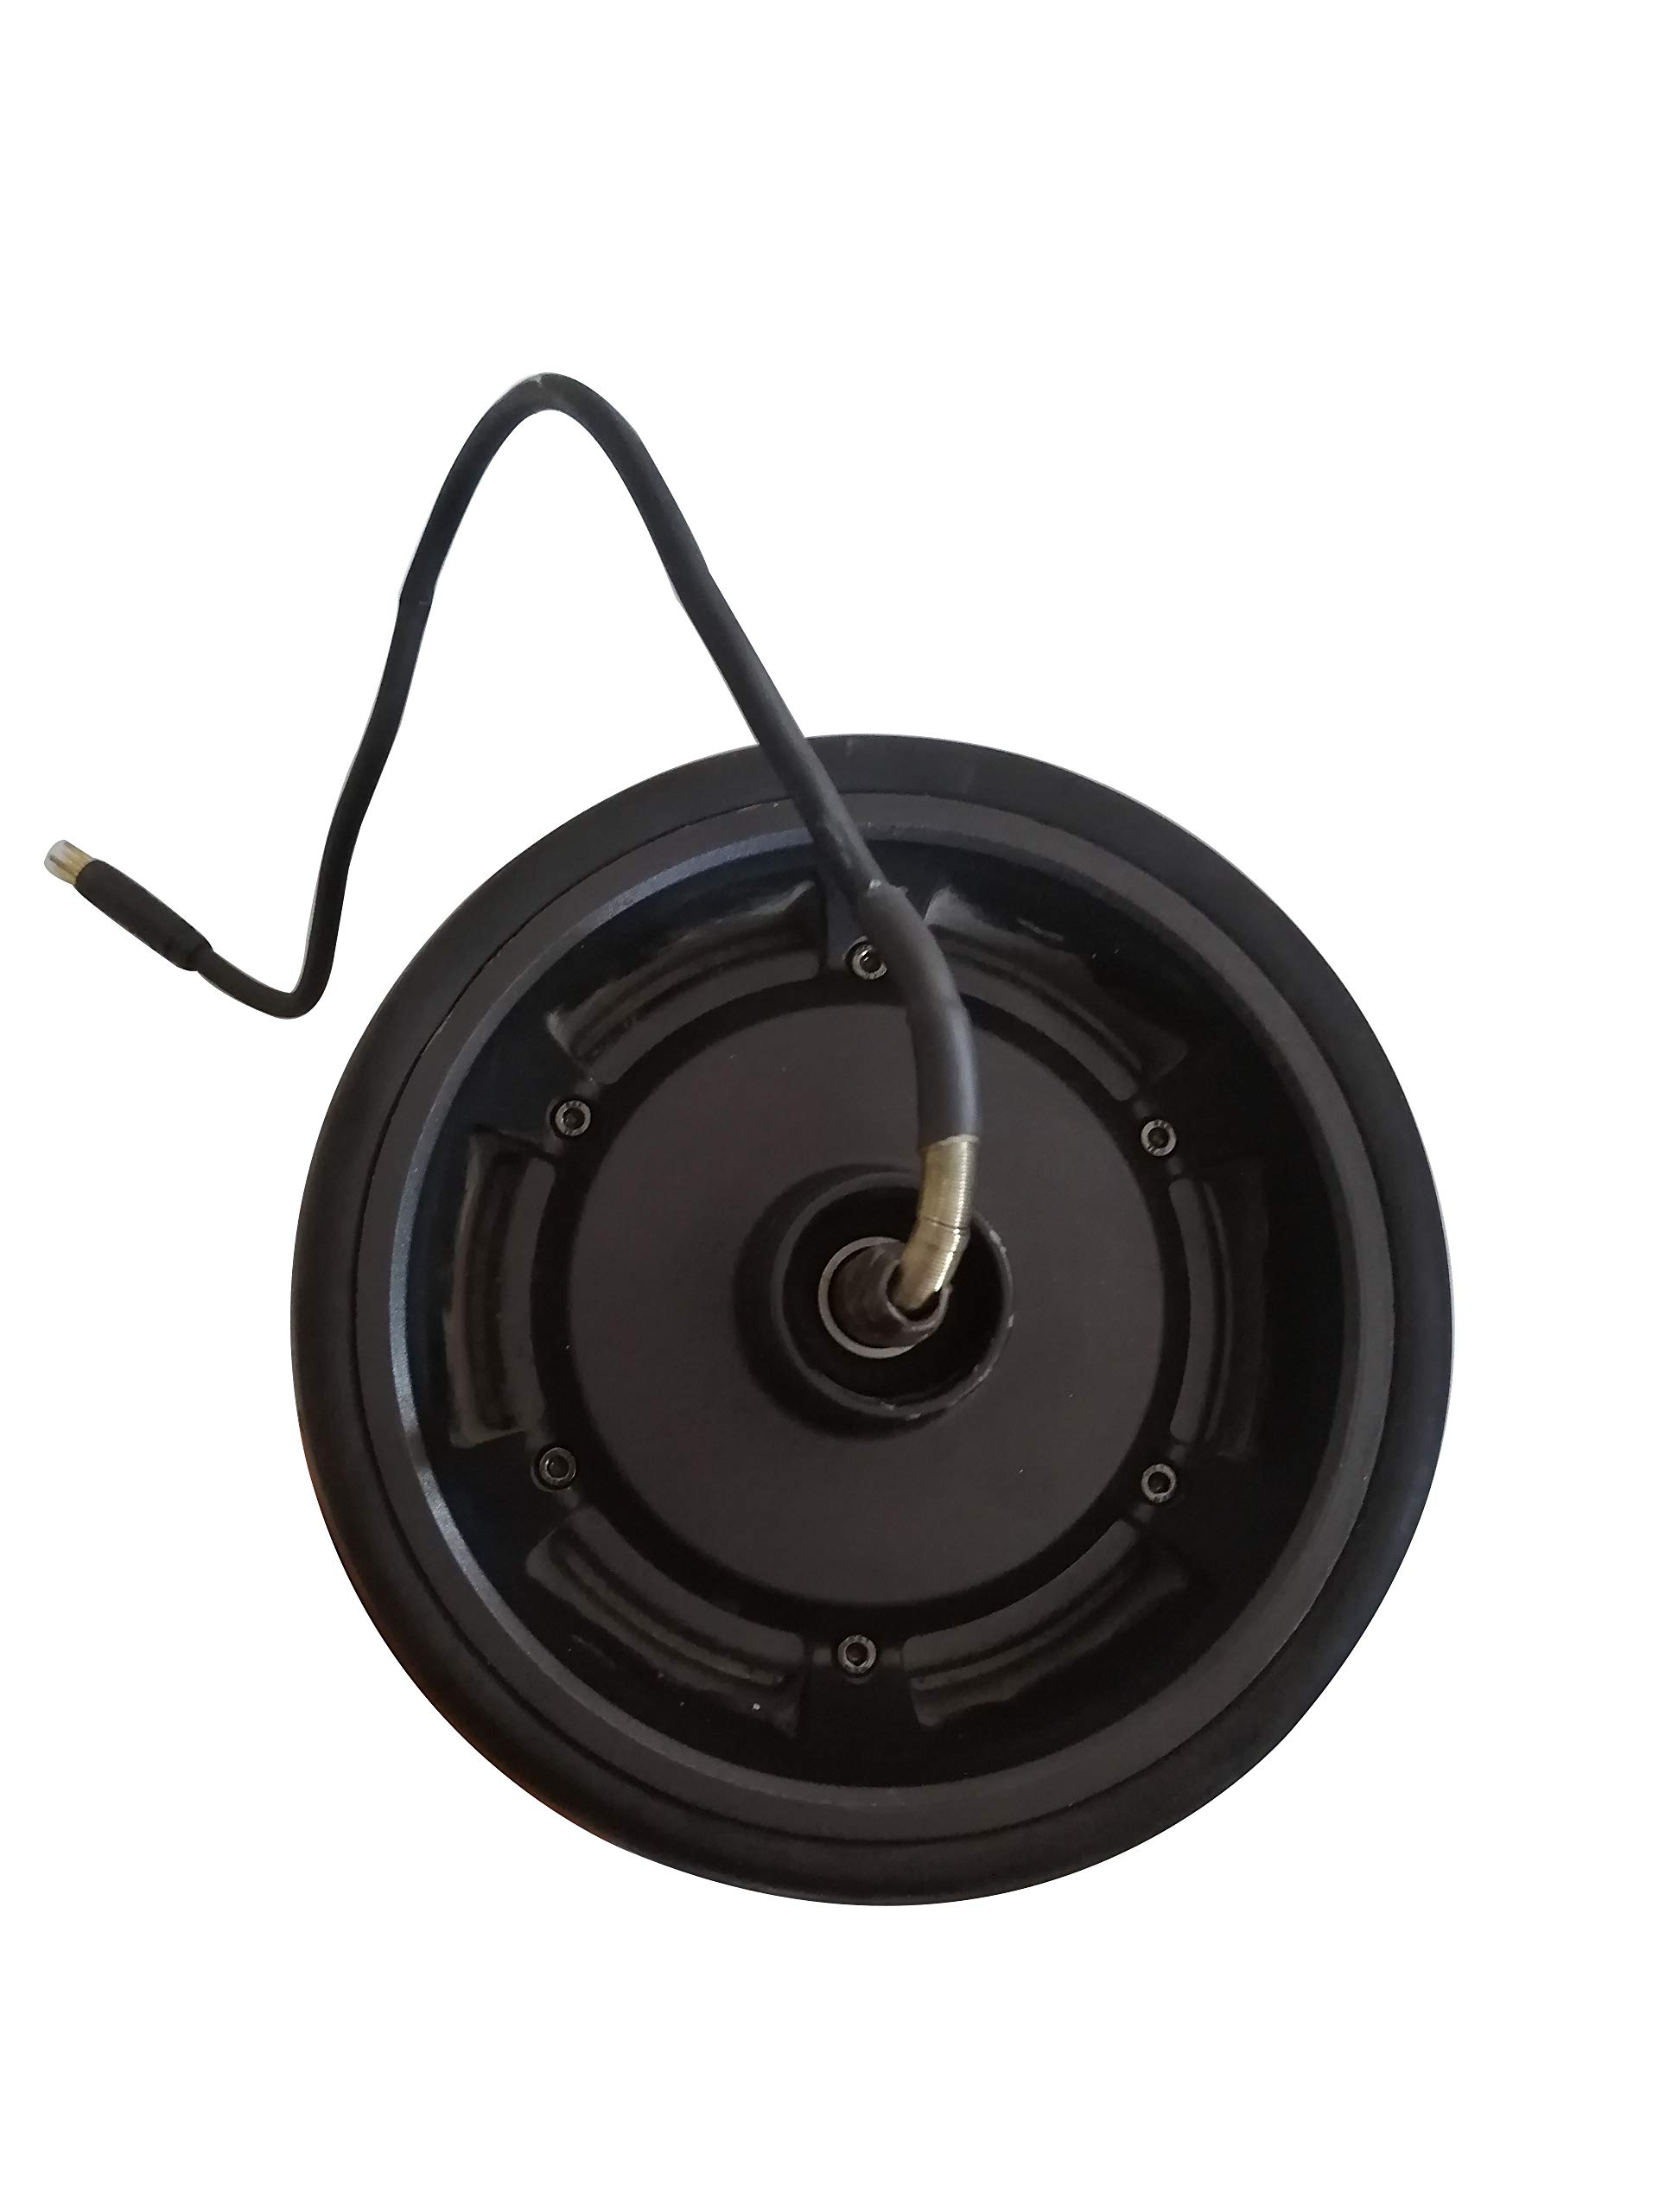 SPEDWHEL Original Motor for Mercane WideWheel Electric Scooter Wide Wheel